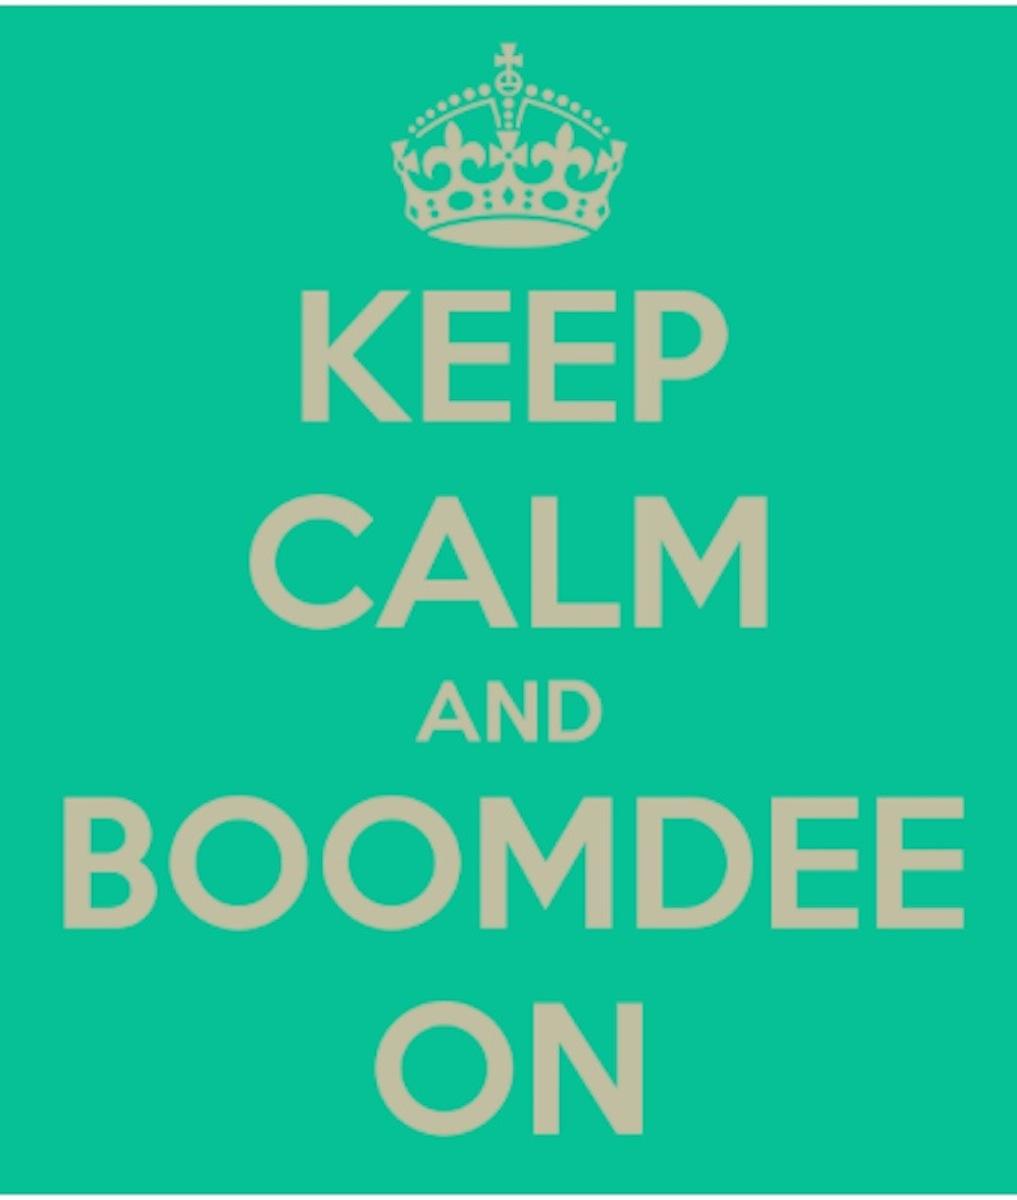 Boomdeeada  I Am Mexican And I Cannot Keep Calm